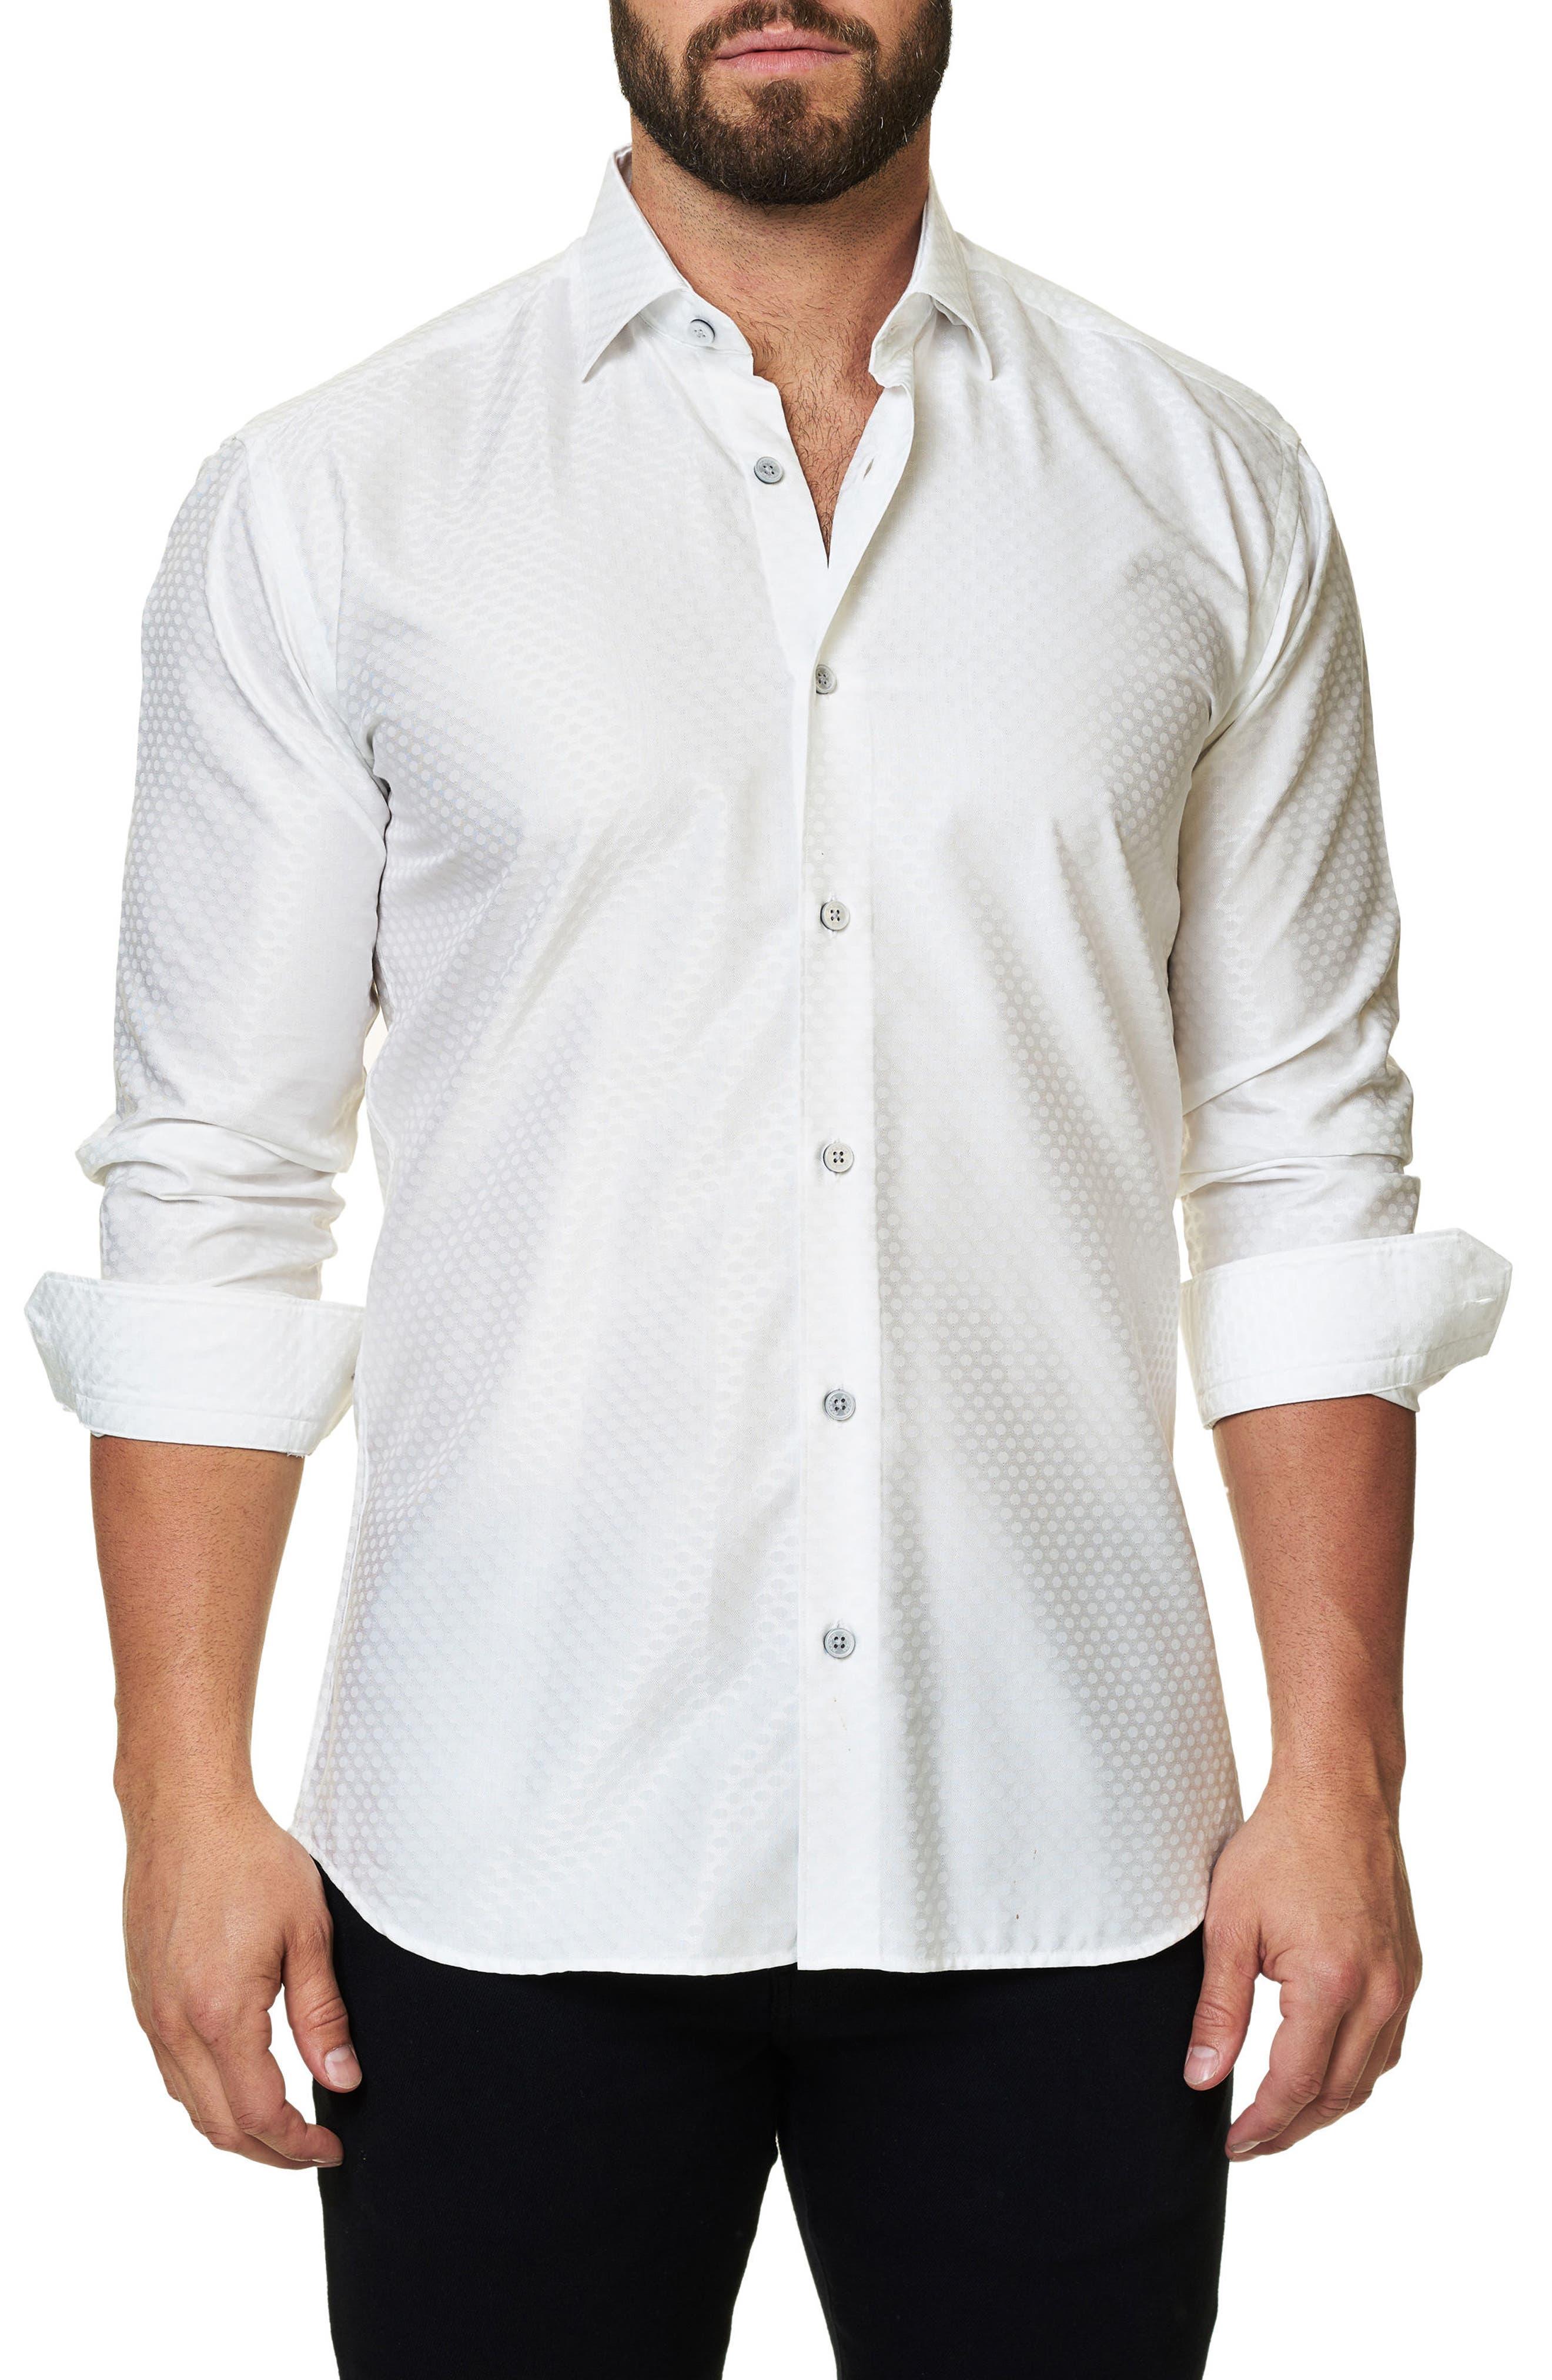 Alternate Image 1 Selected - Maceoo Trim Fit Dot Print Sport Shirt